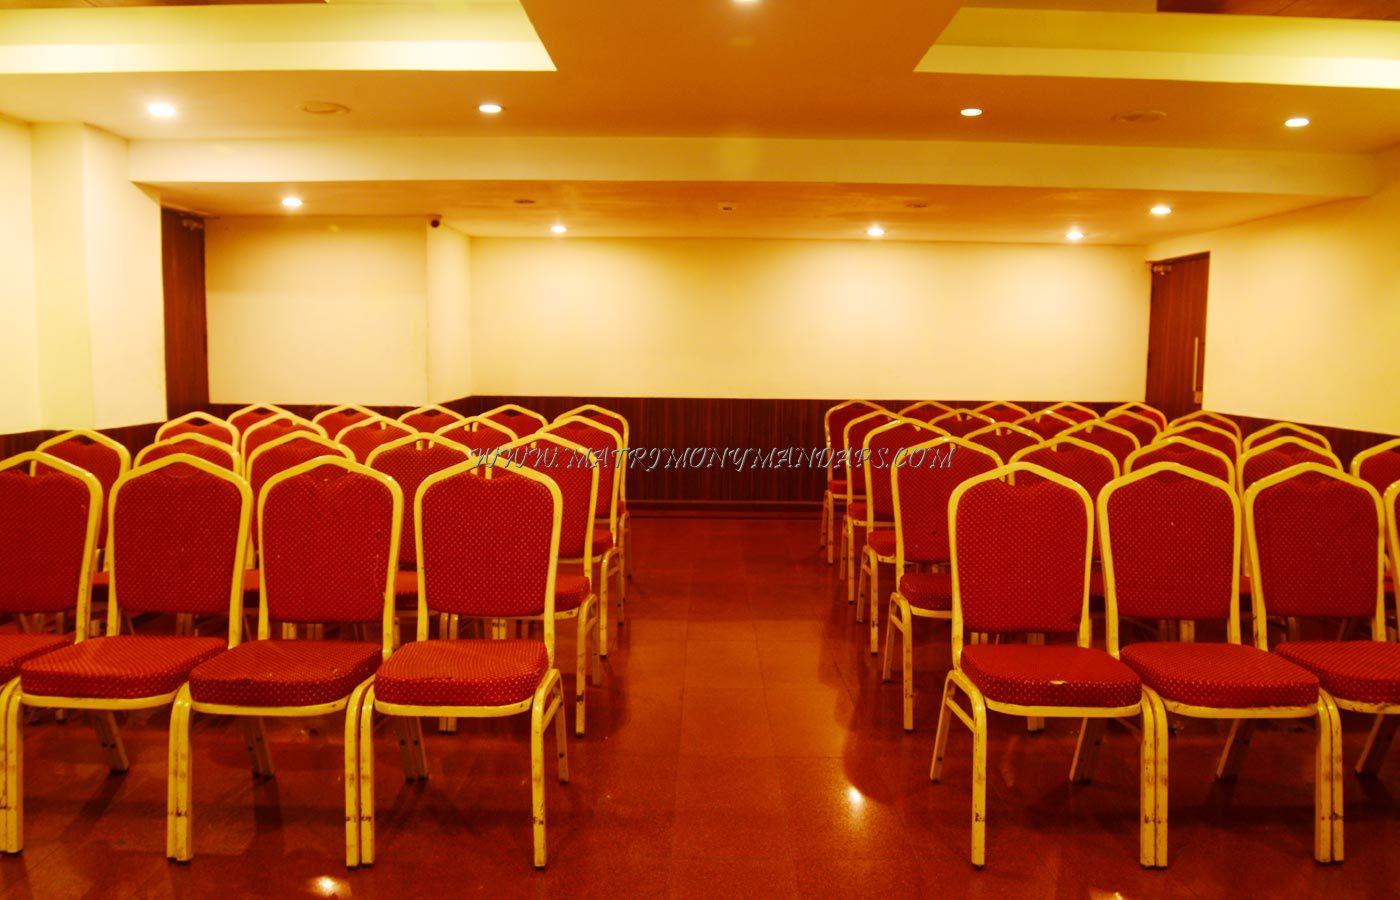 Simsan Hotel - Pre-function Area